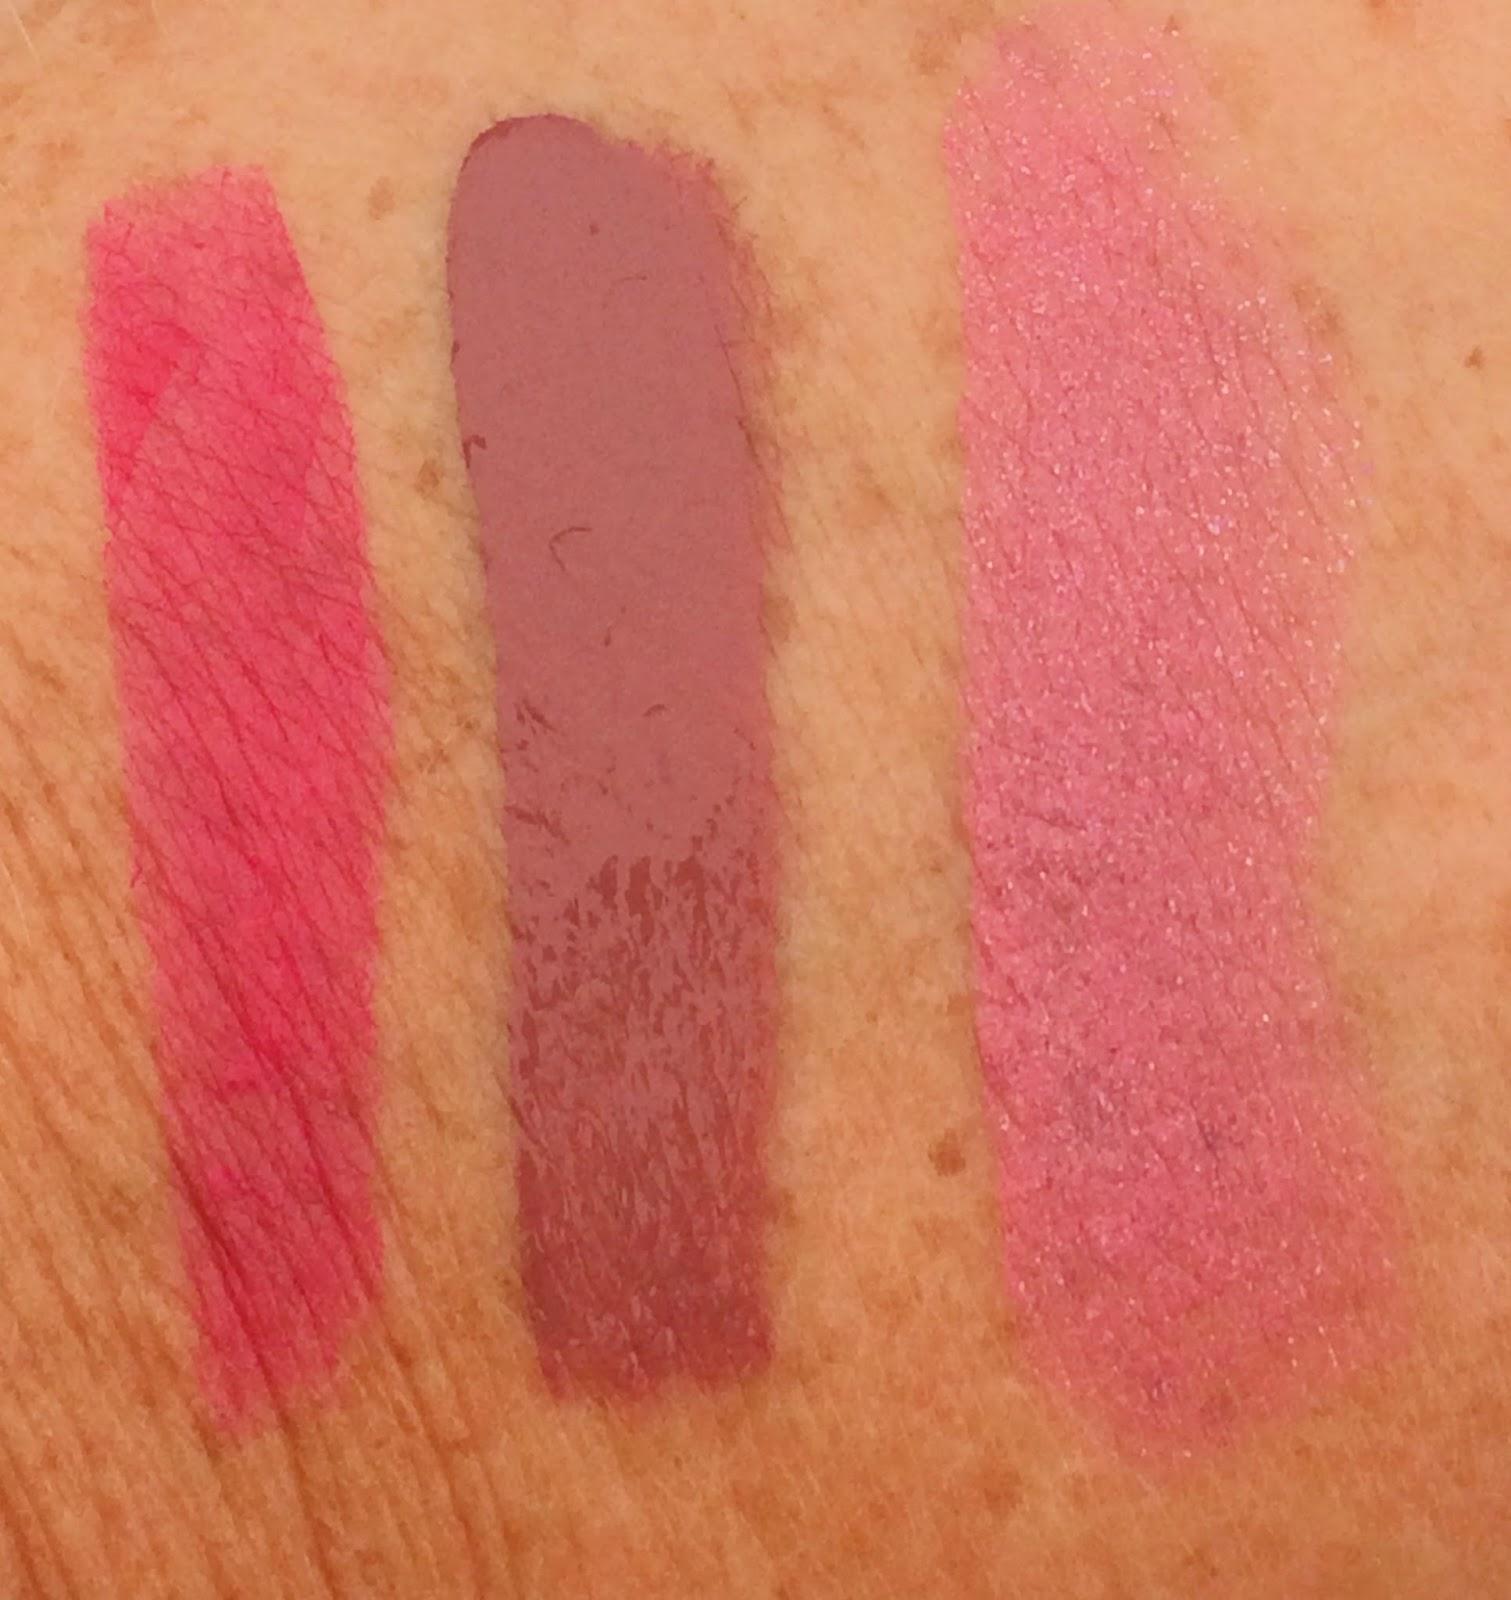 Kat Von D Everlasting Liquid Lipstick Lolita, Charlotte Tilbury Modern Matte lipstick The Queen, Kat Von D Studded Lipstick Magick, Swatches, Review